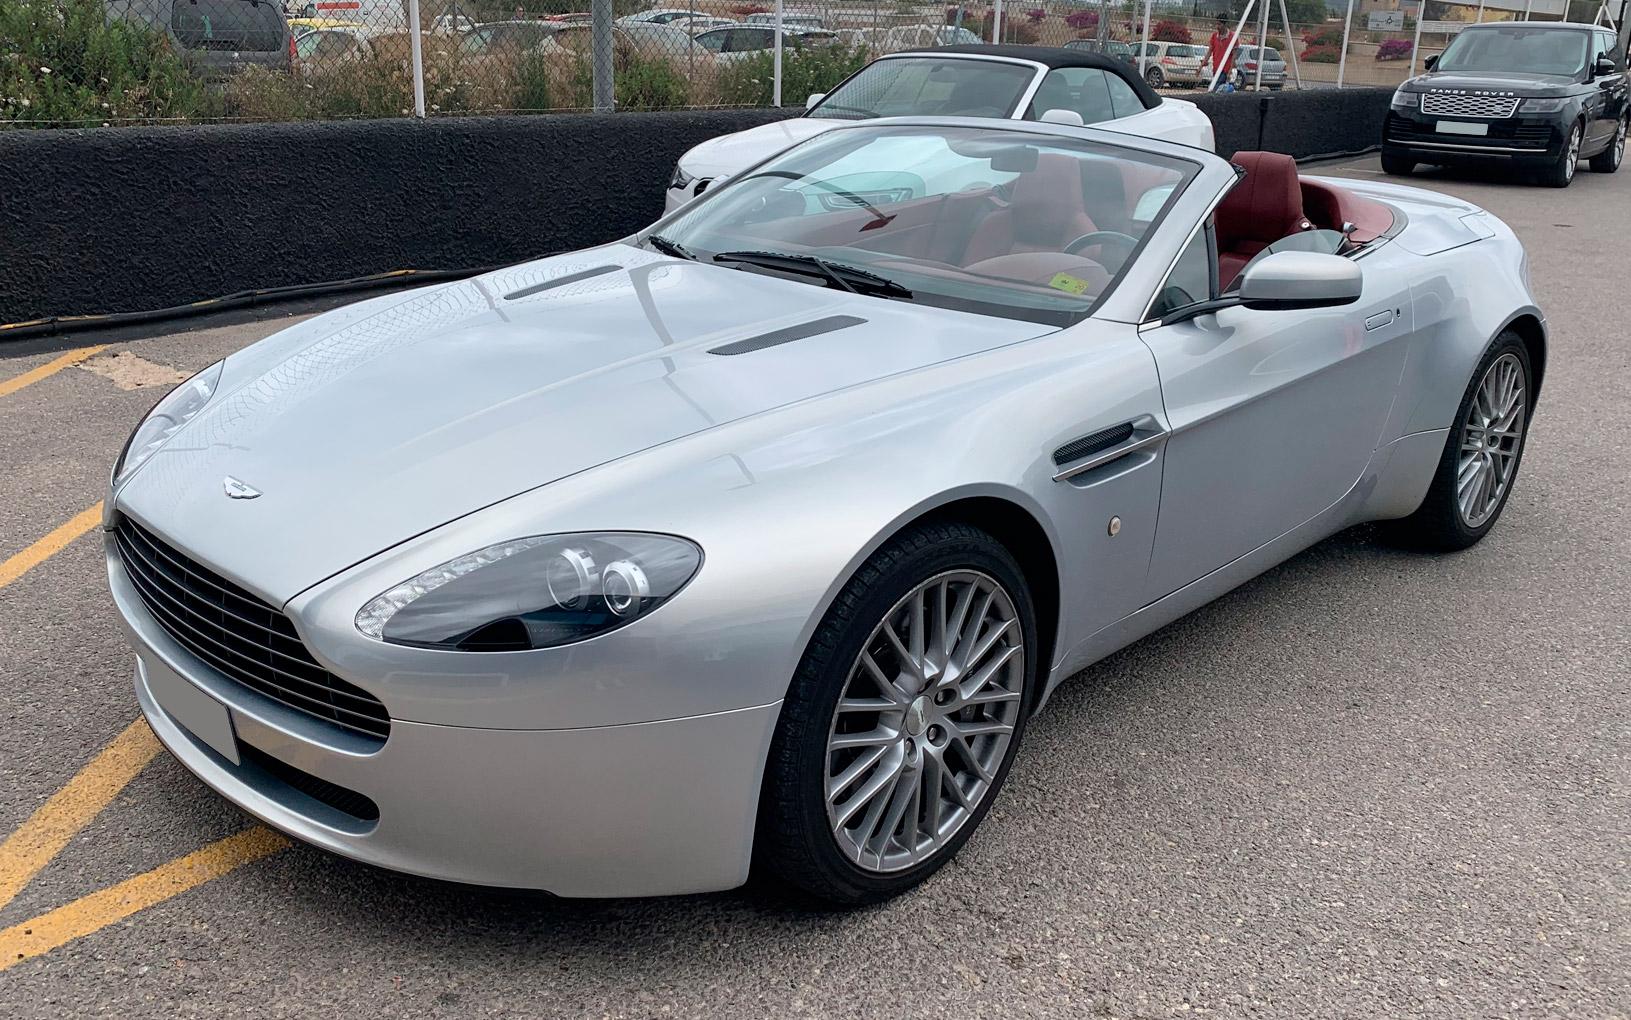 Aston Martin Vanquish Rental Ibiza (2)